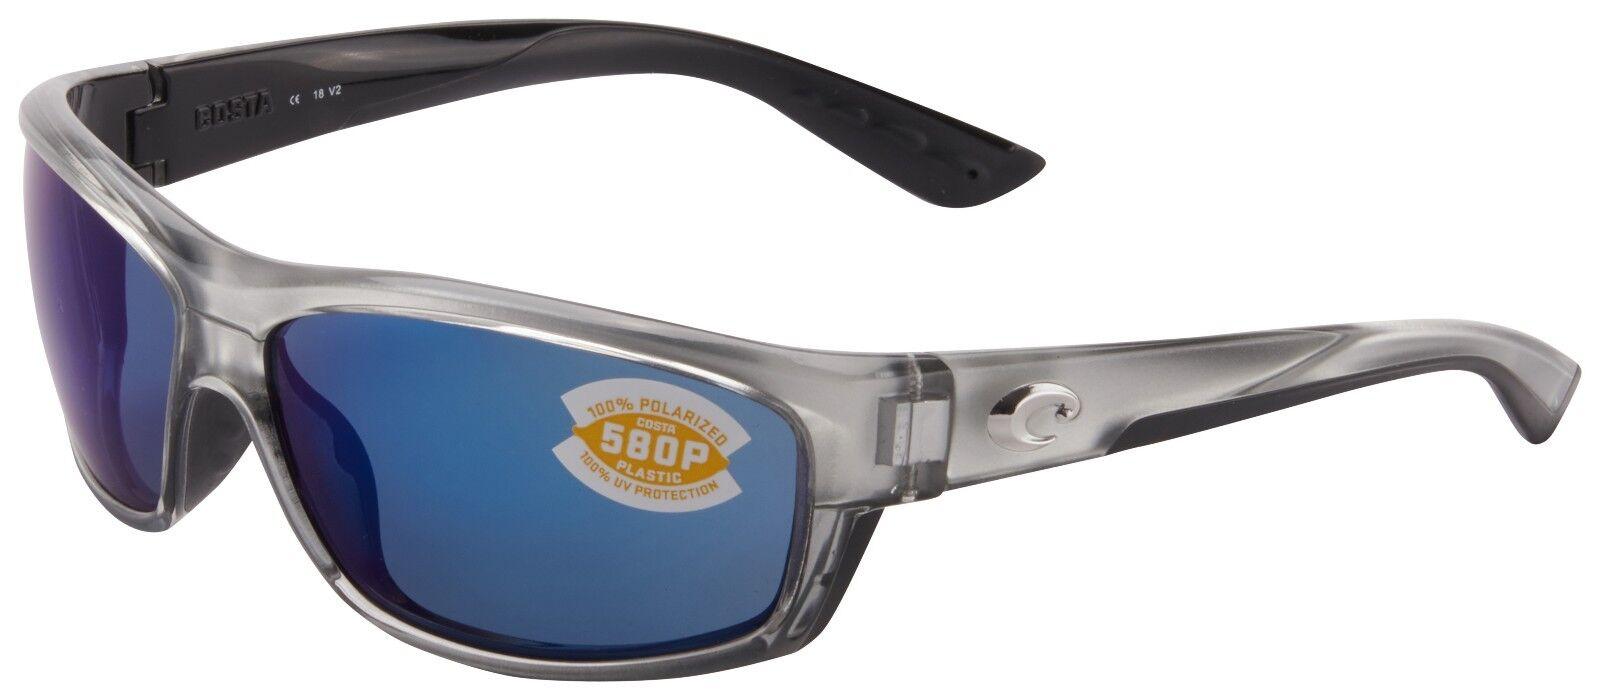 New Costa Del Mar Saltbreak Polarized Sunglasses Tortoise Gray